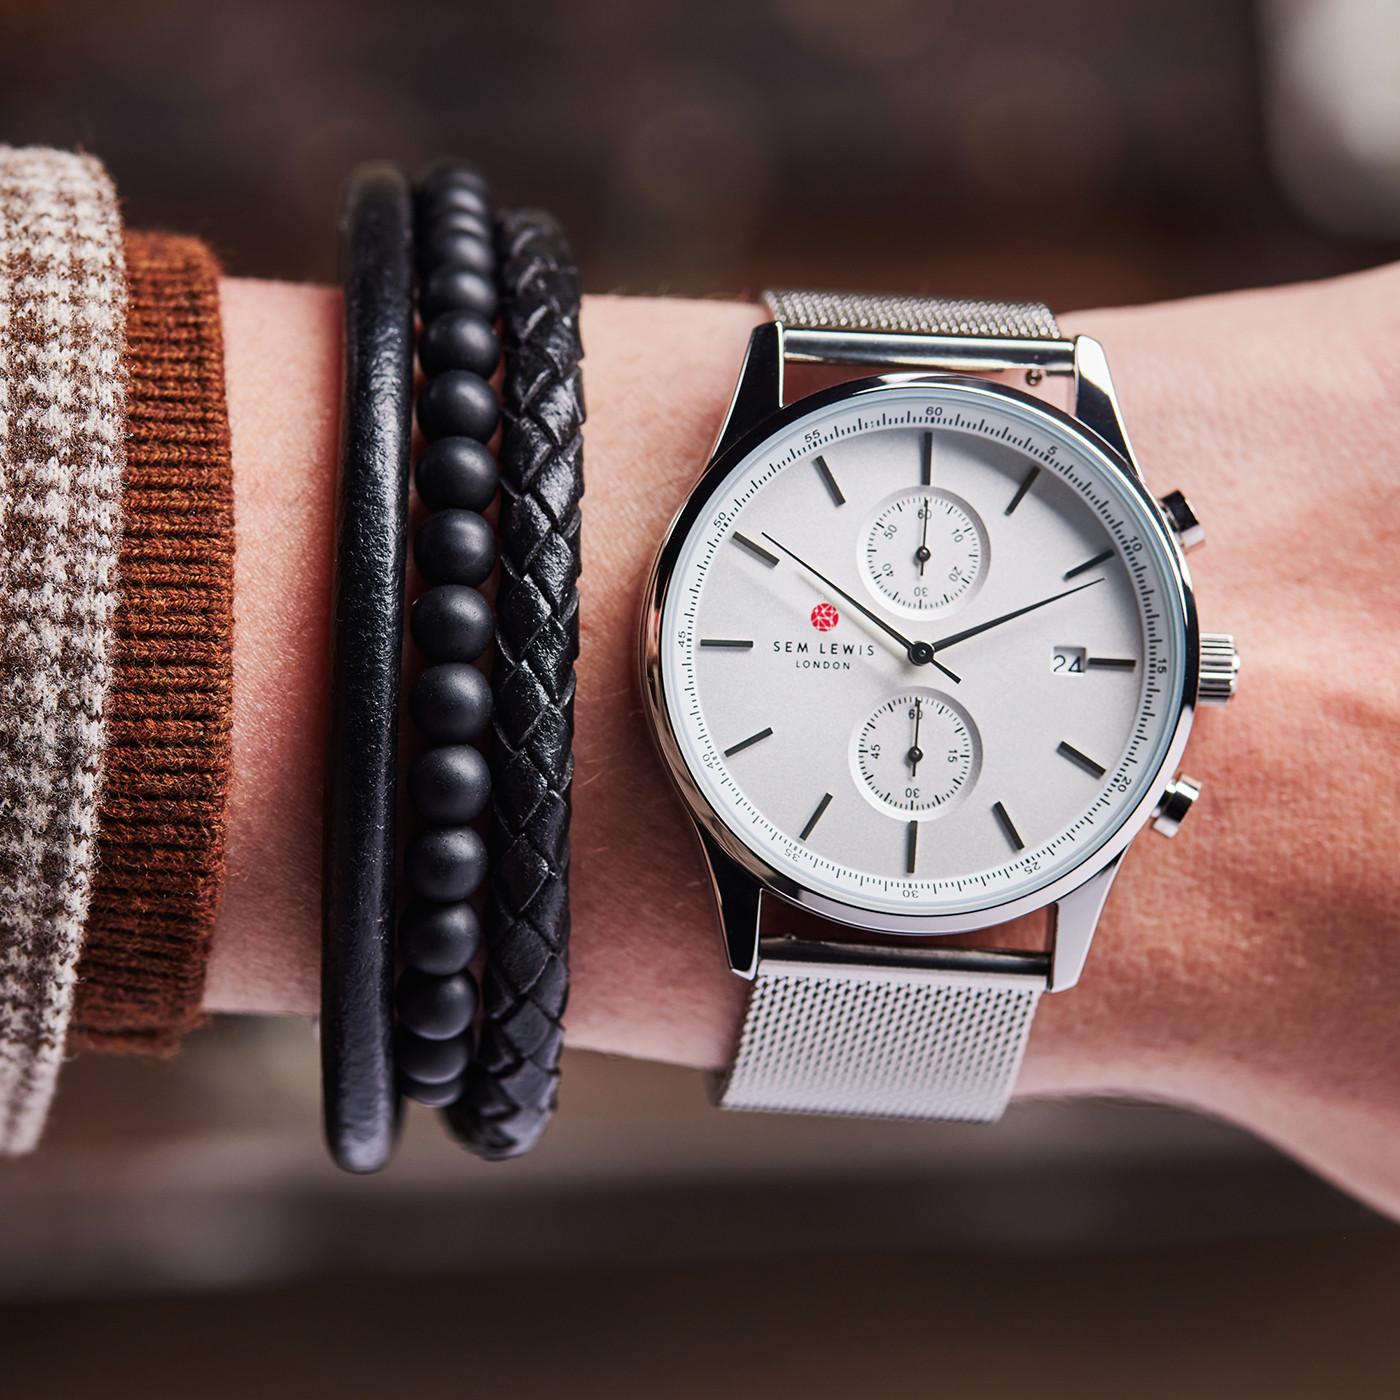 Sem Lewis Piccadilly South Kensington Armband SL320012 (Lengte: 21.5 cm)